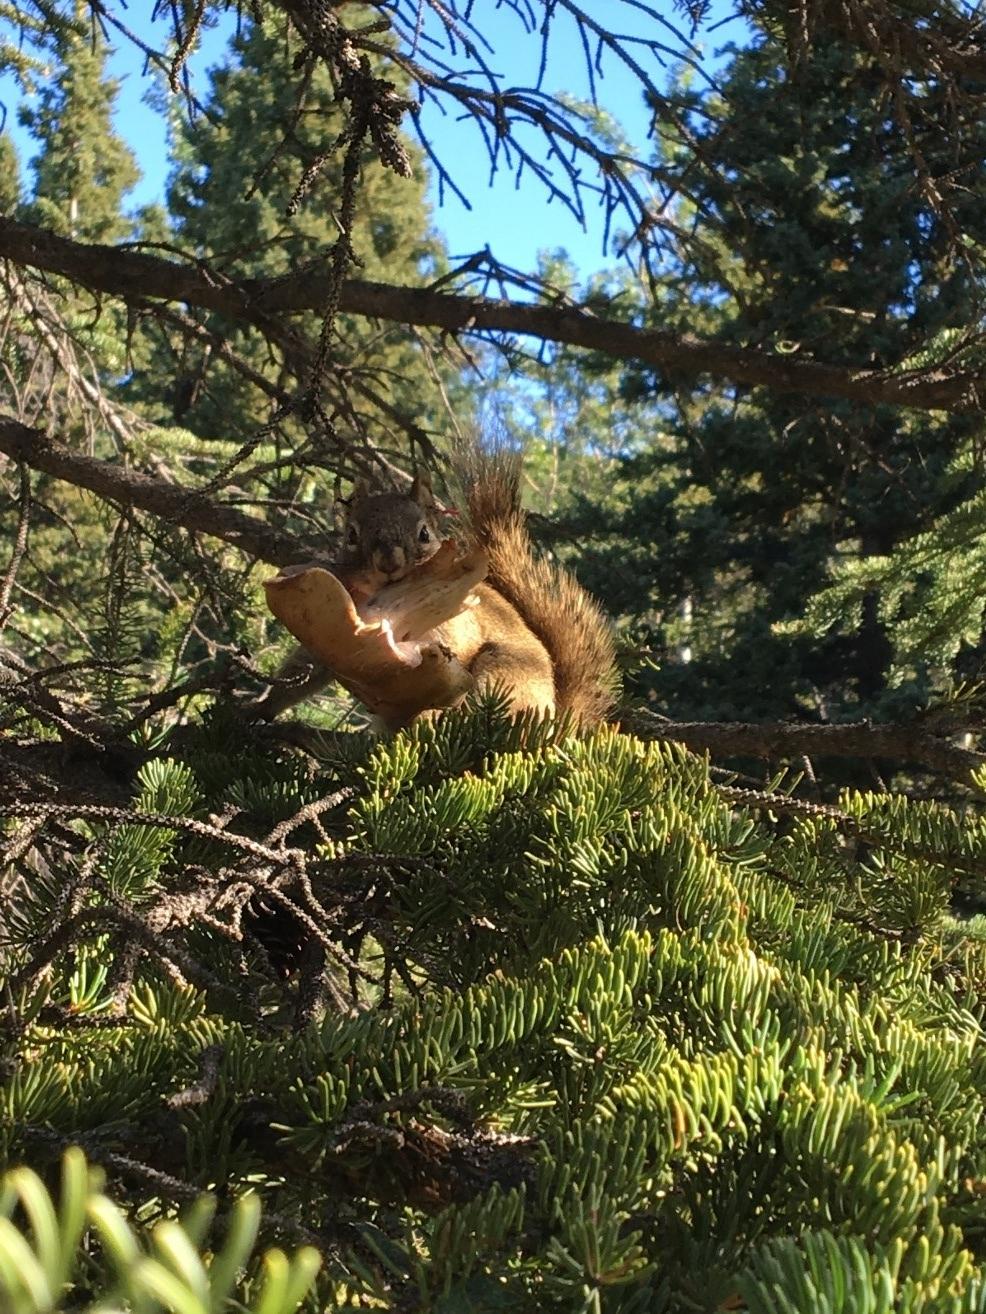 A Yukon squirrel collecting mushrooms